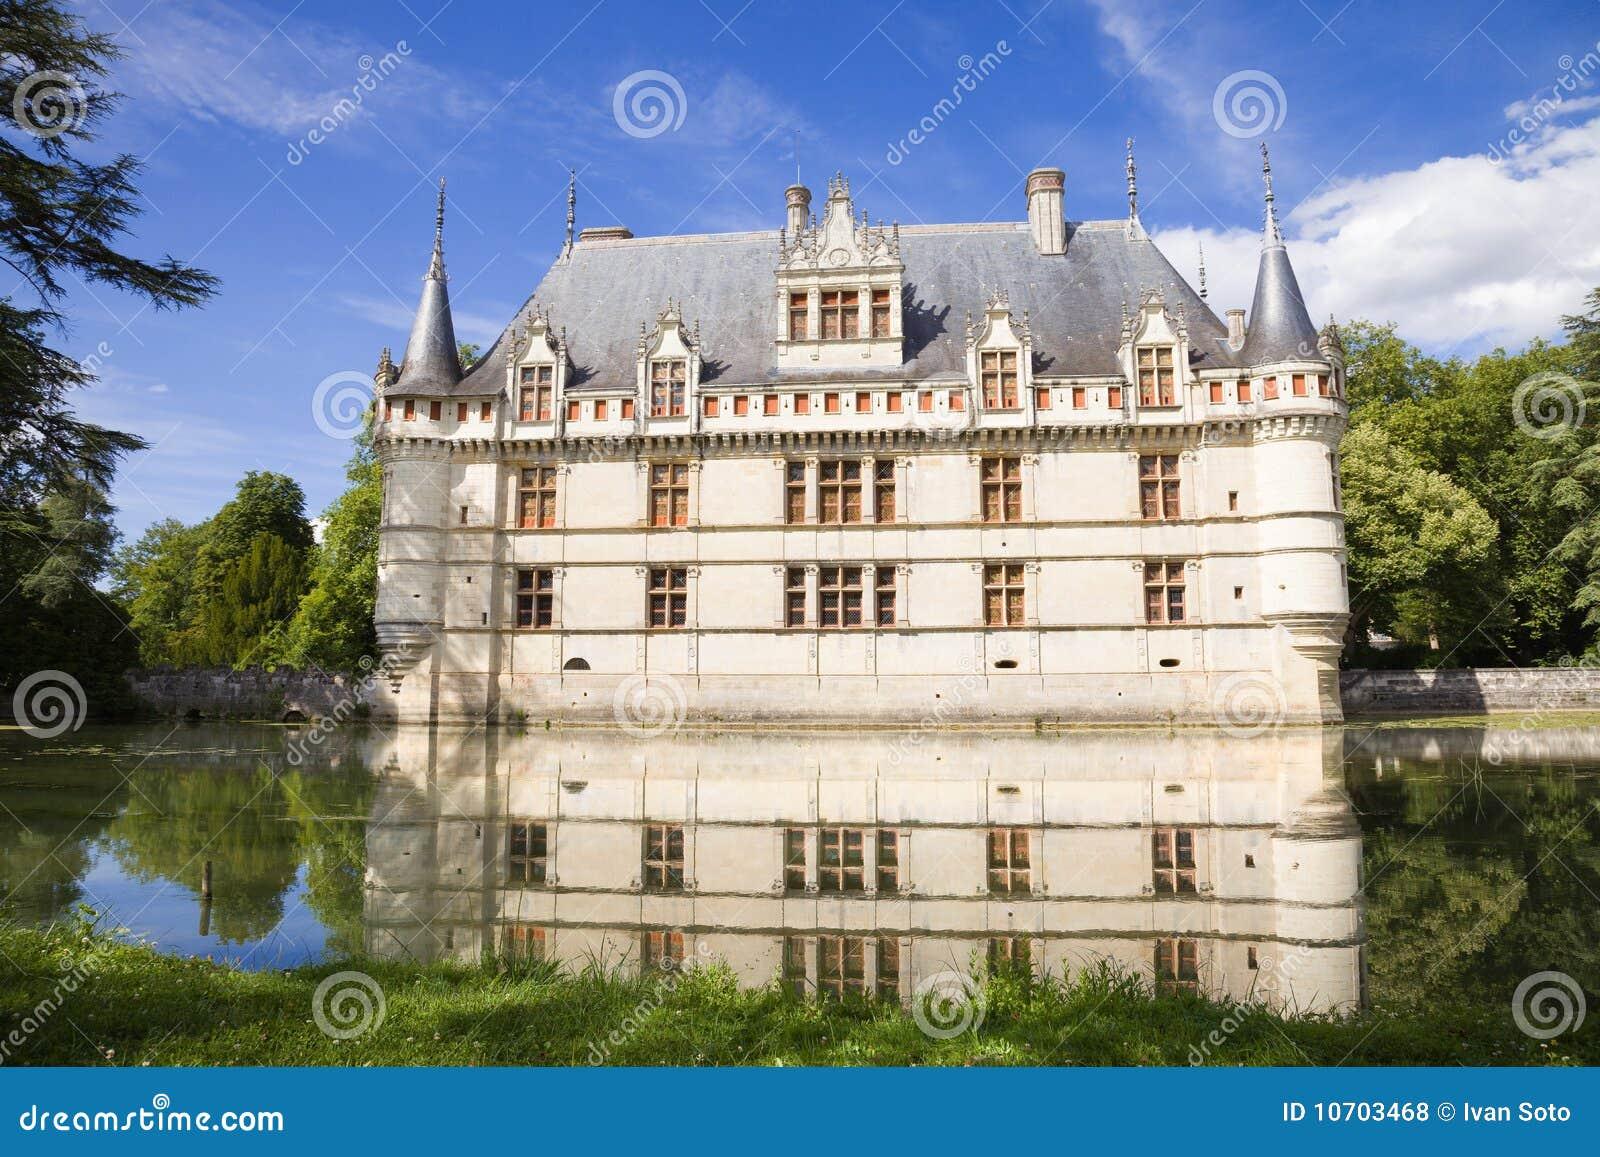 azay le rideau chateau france royalty free stock photos image 10703468. Black Bedroom Furniture Sets. Home Design Ideas